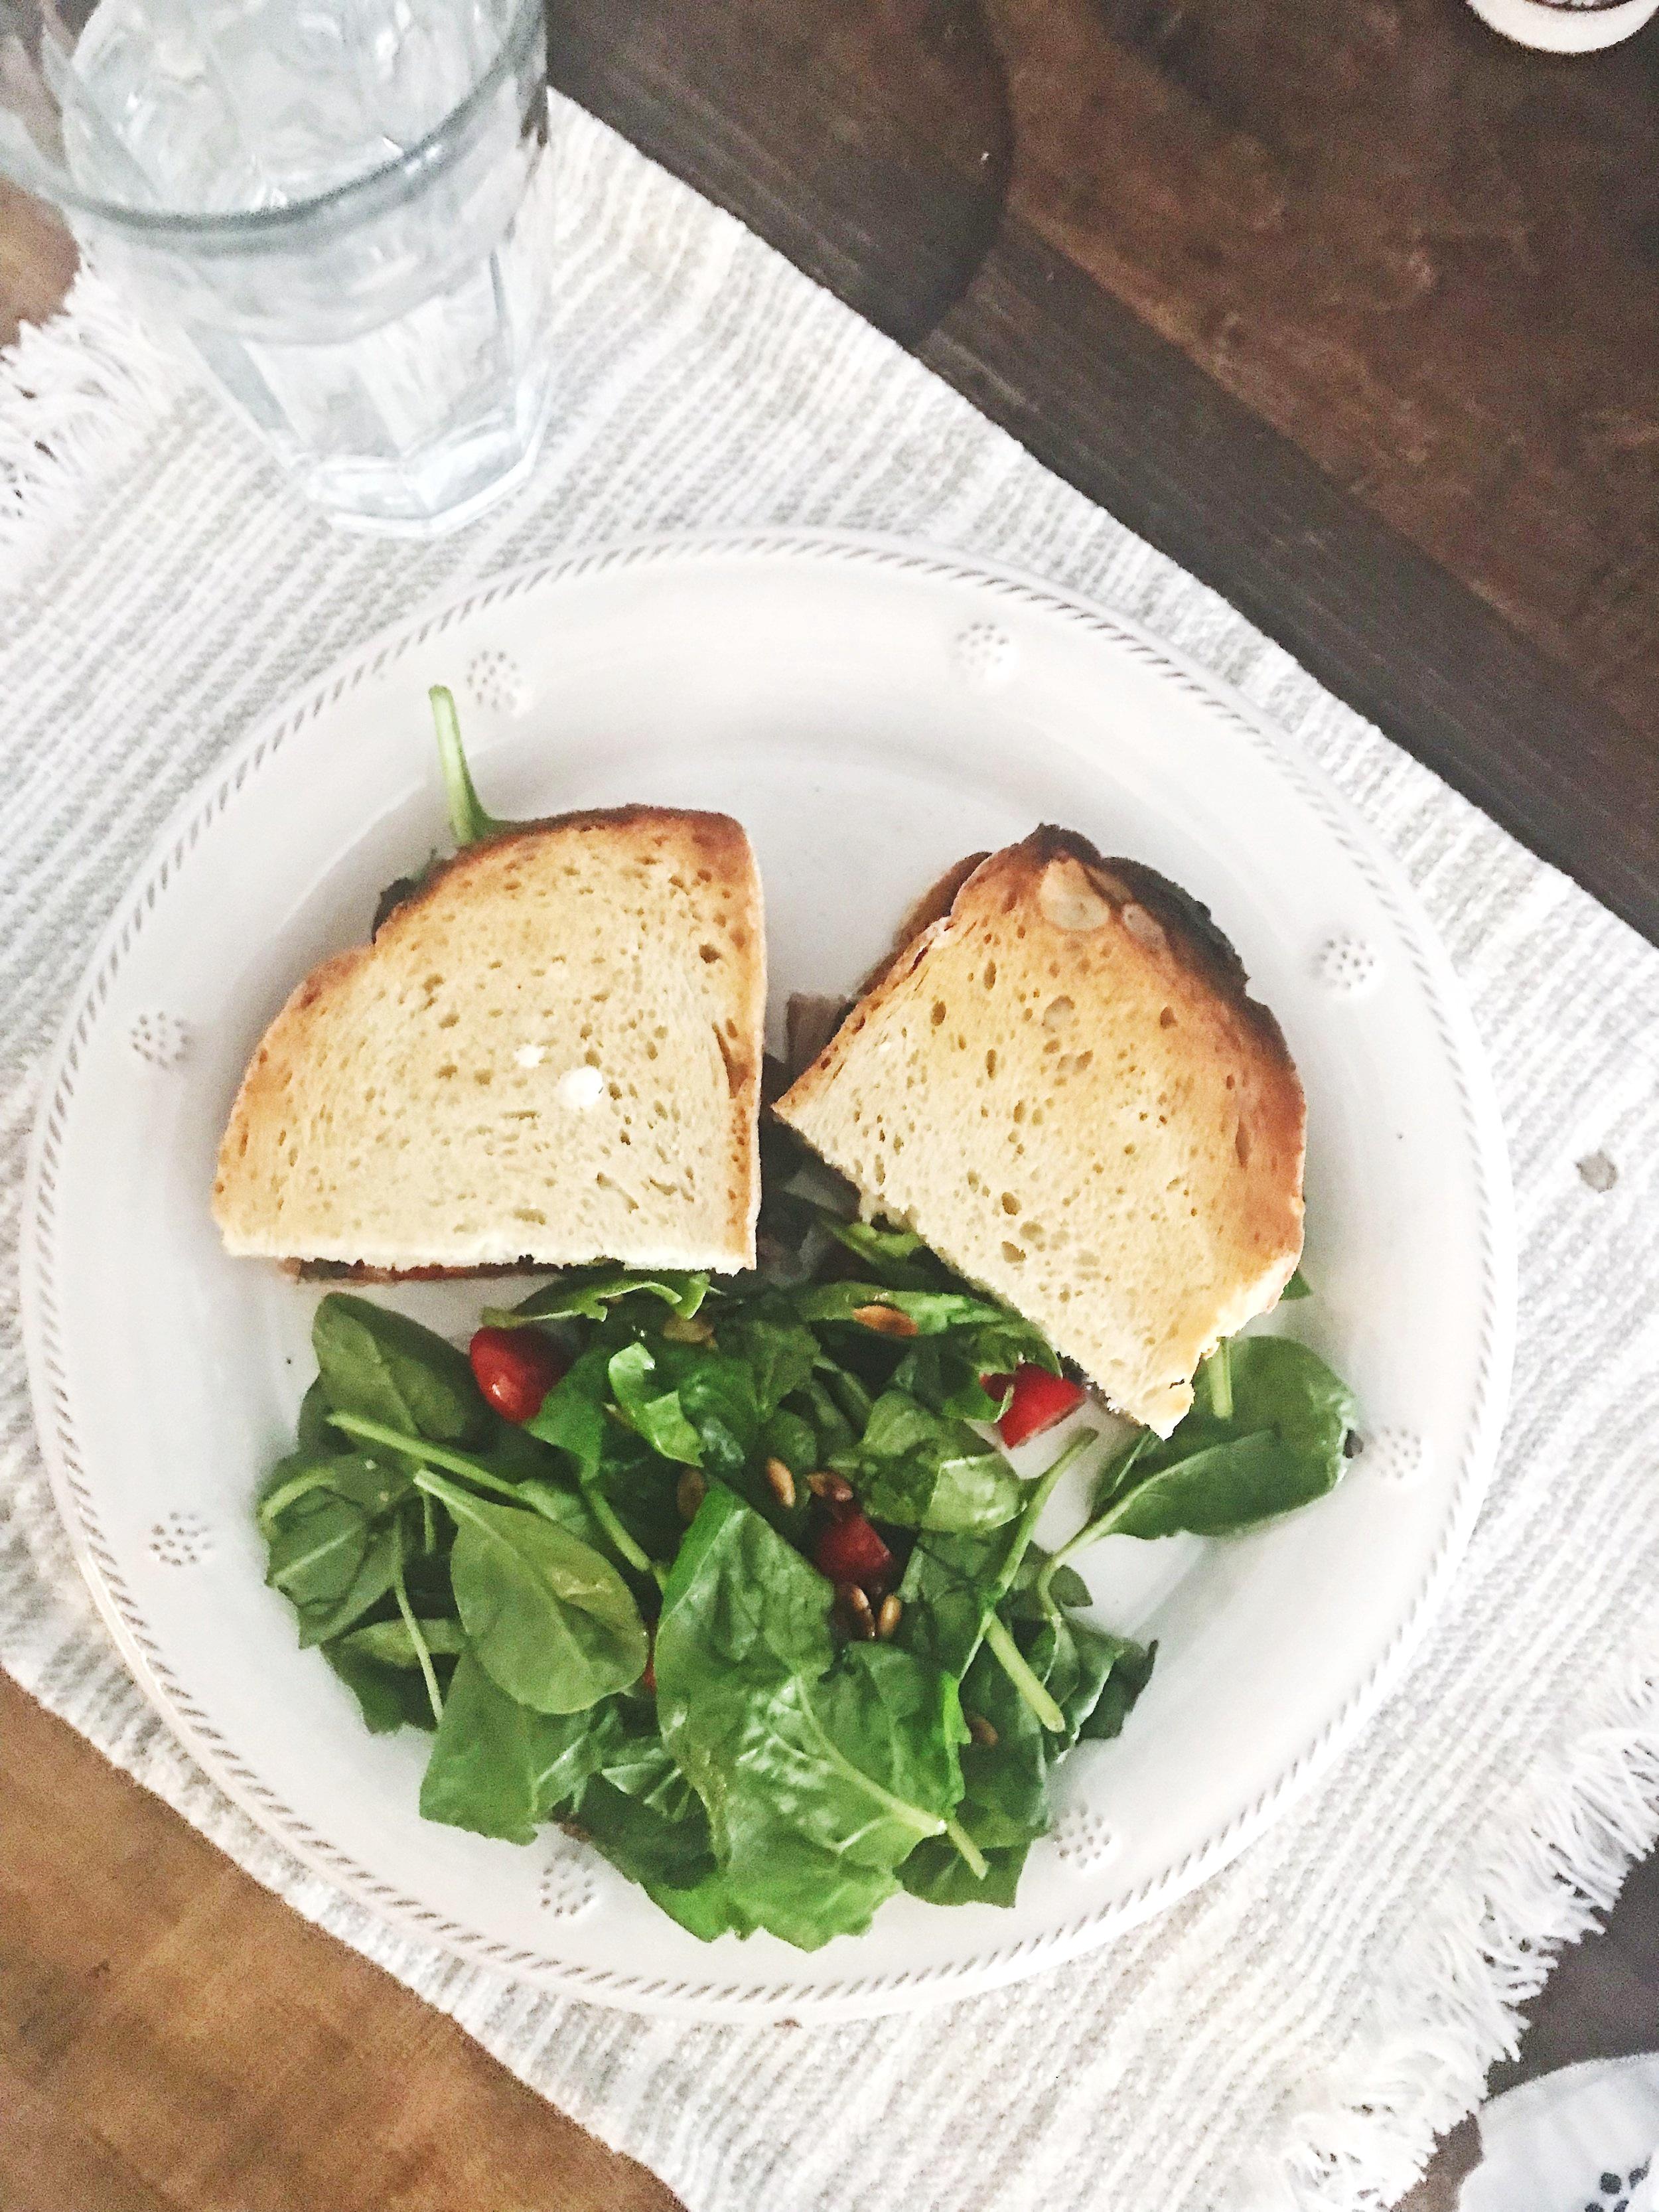 Sandwich_Salad_aerialJPG.jpg